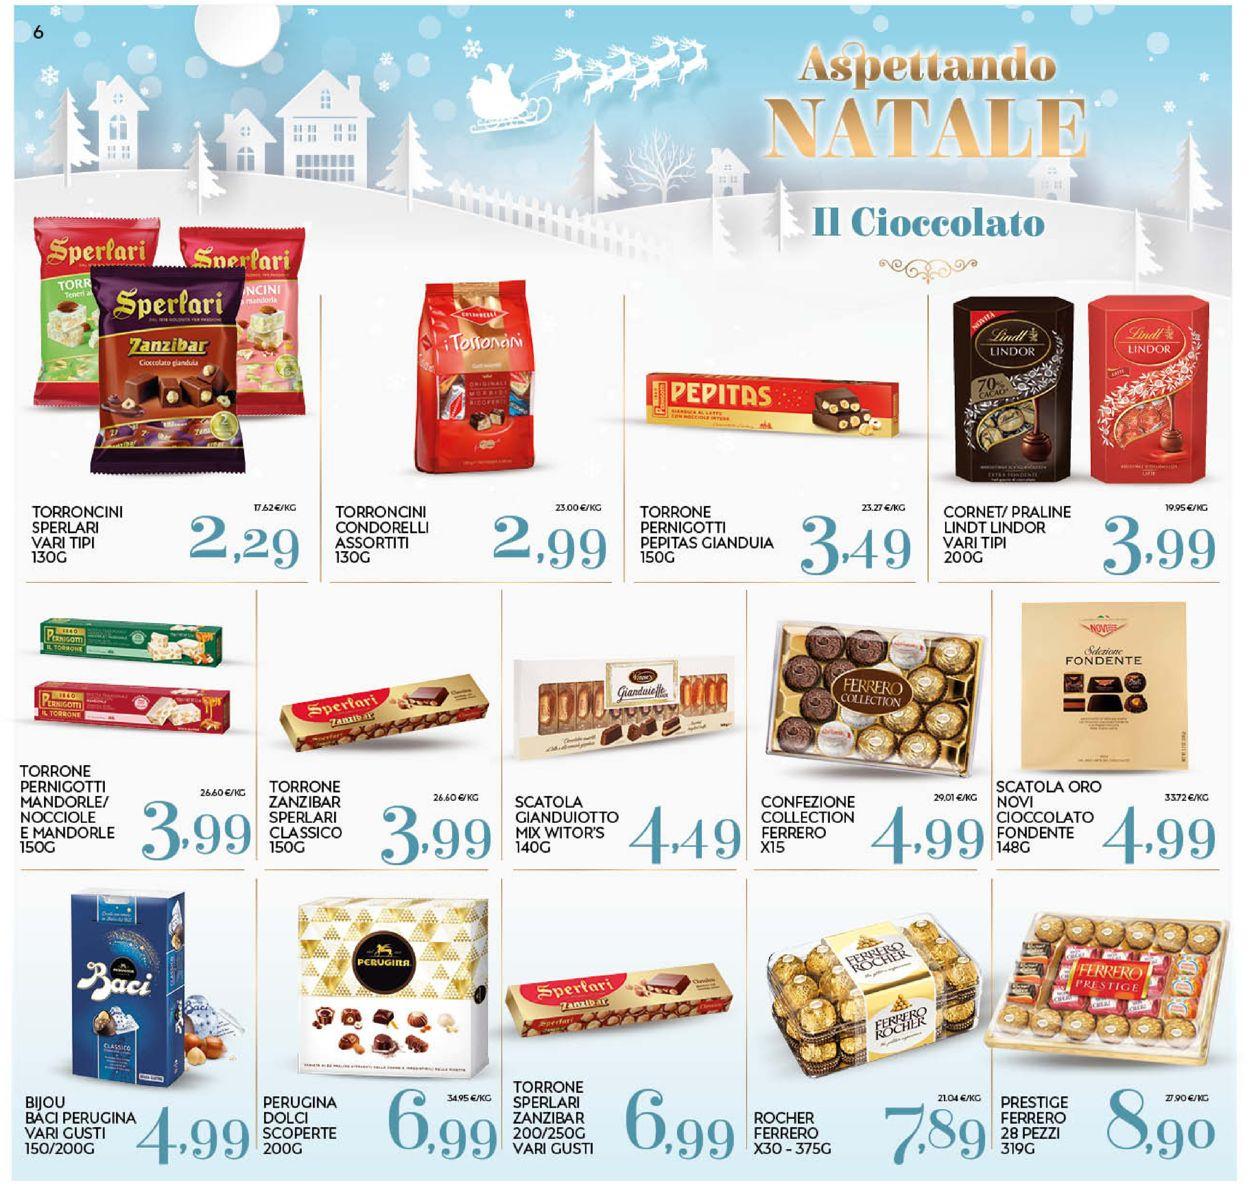 Volantino Despar - Natale 2020 - Offerte 03/12-15/12/2020 (Pagina 6)